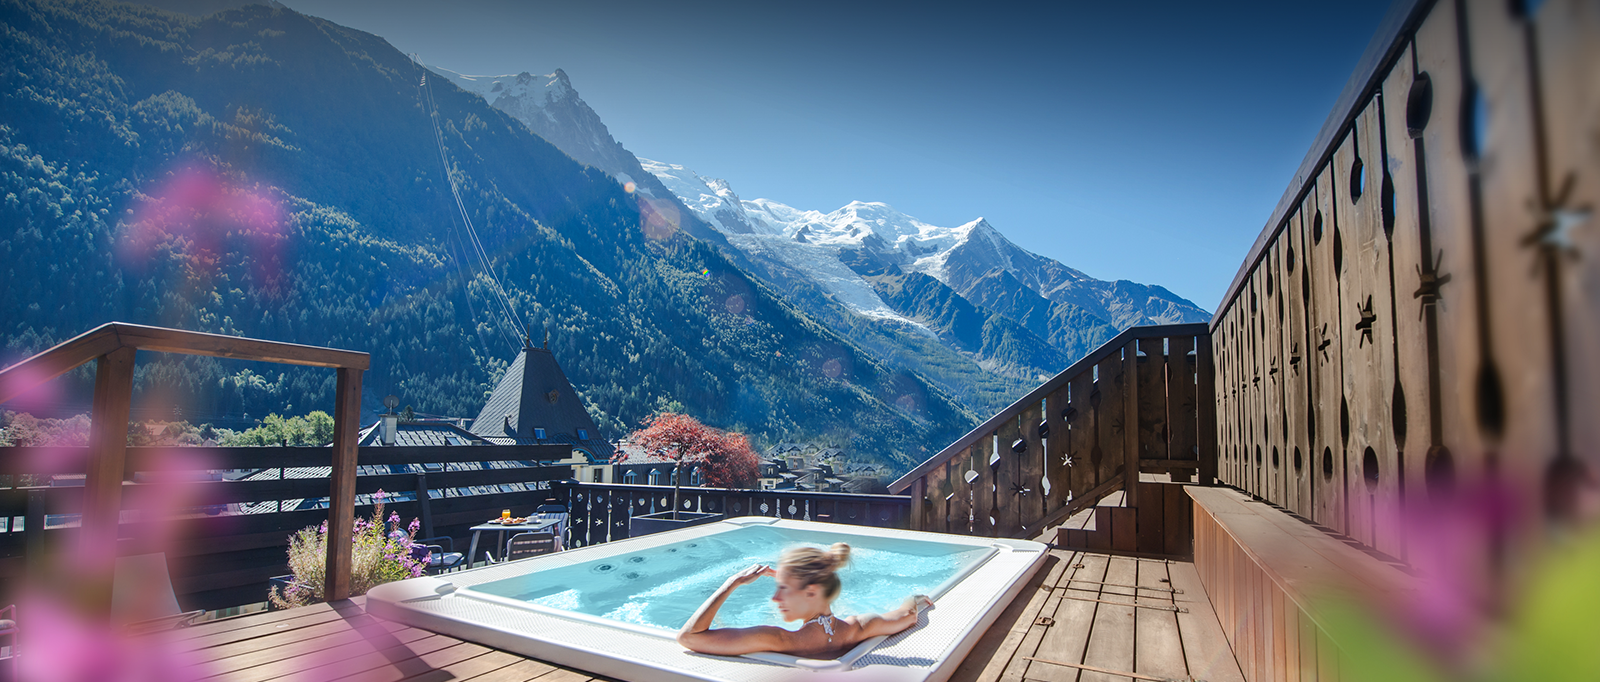 park h tel suisse spa h tel 4 toiles chamonix mont blanc. Black Bedroom Furniture Sets. Home Design Ideas